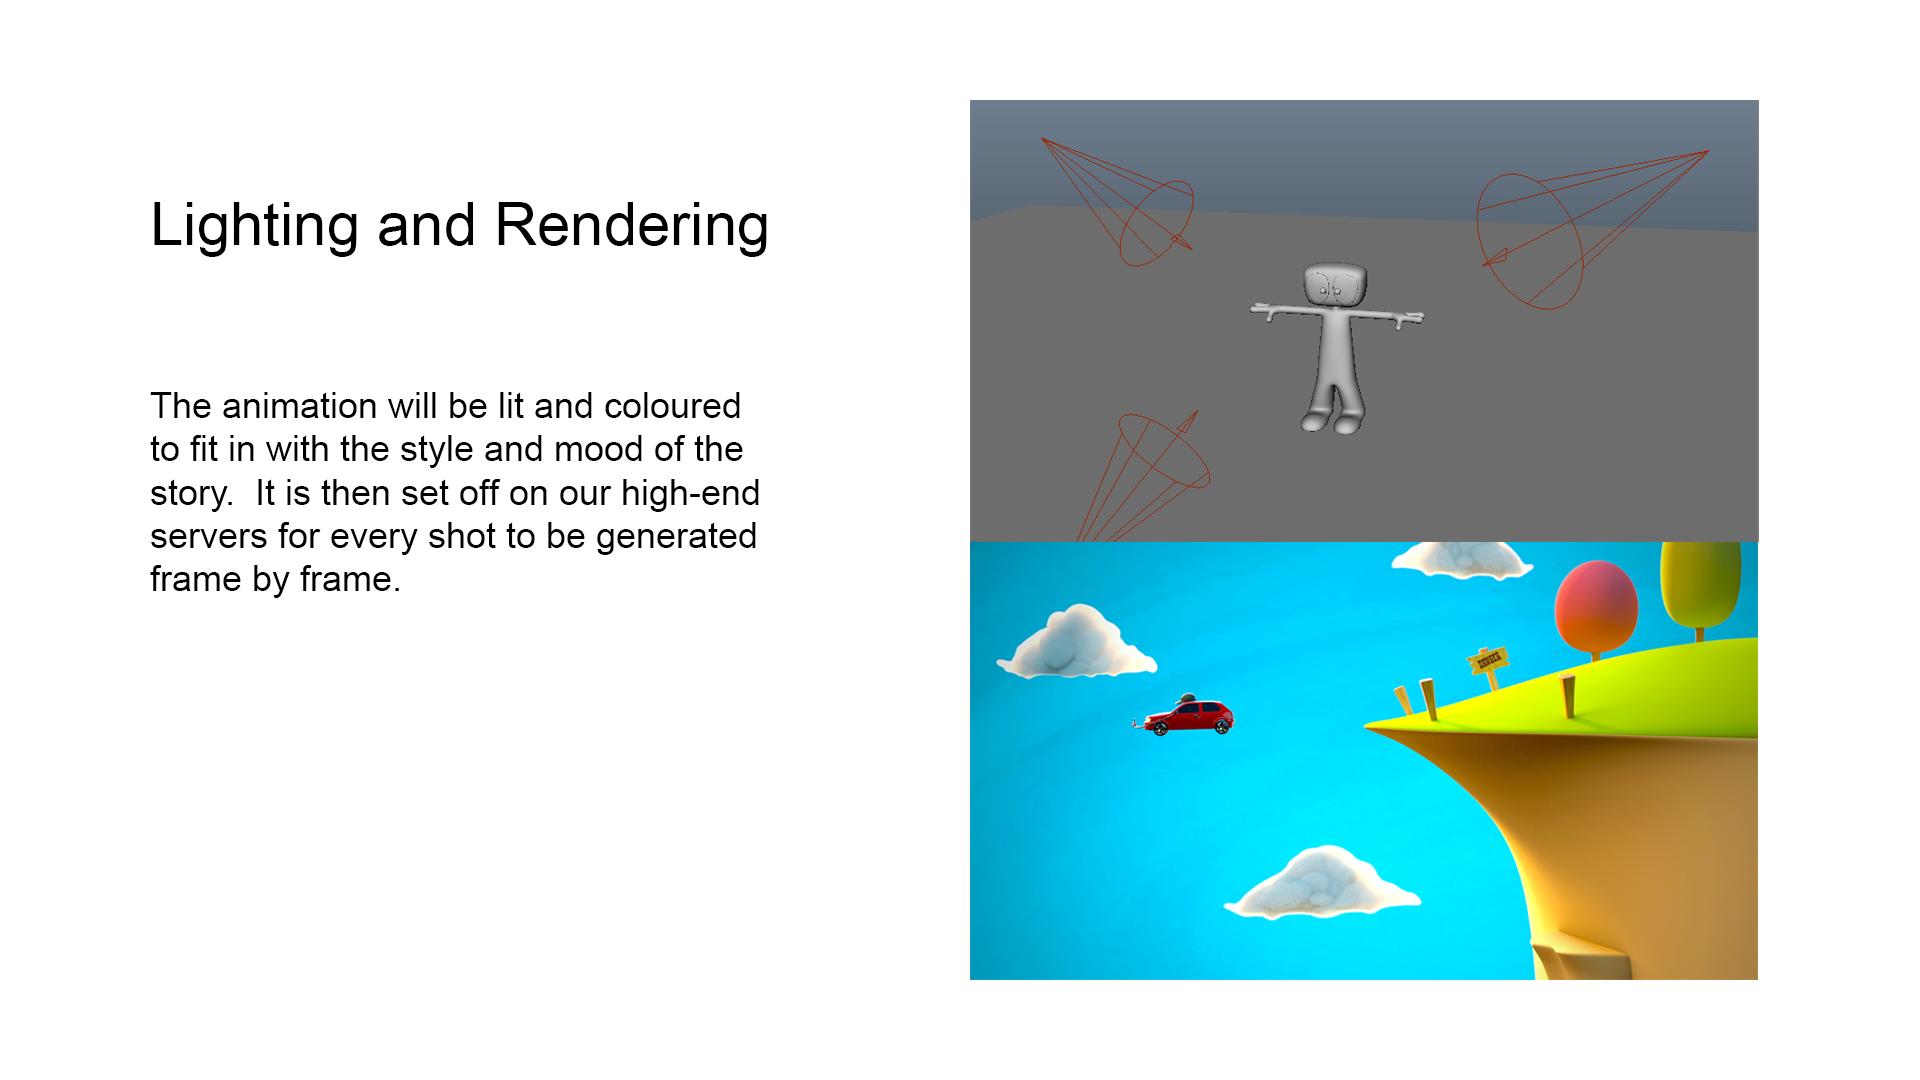 lightingAndRendering.png